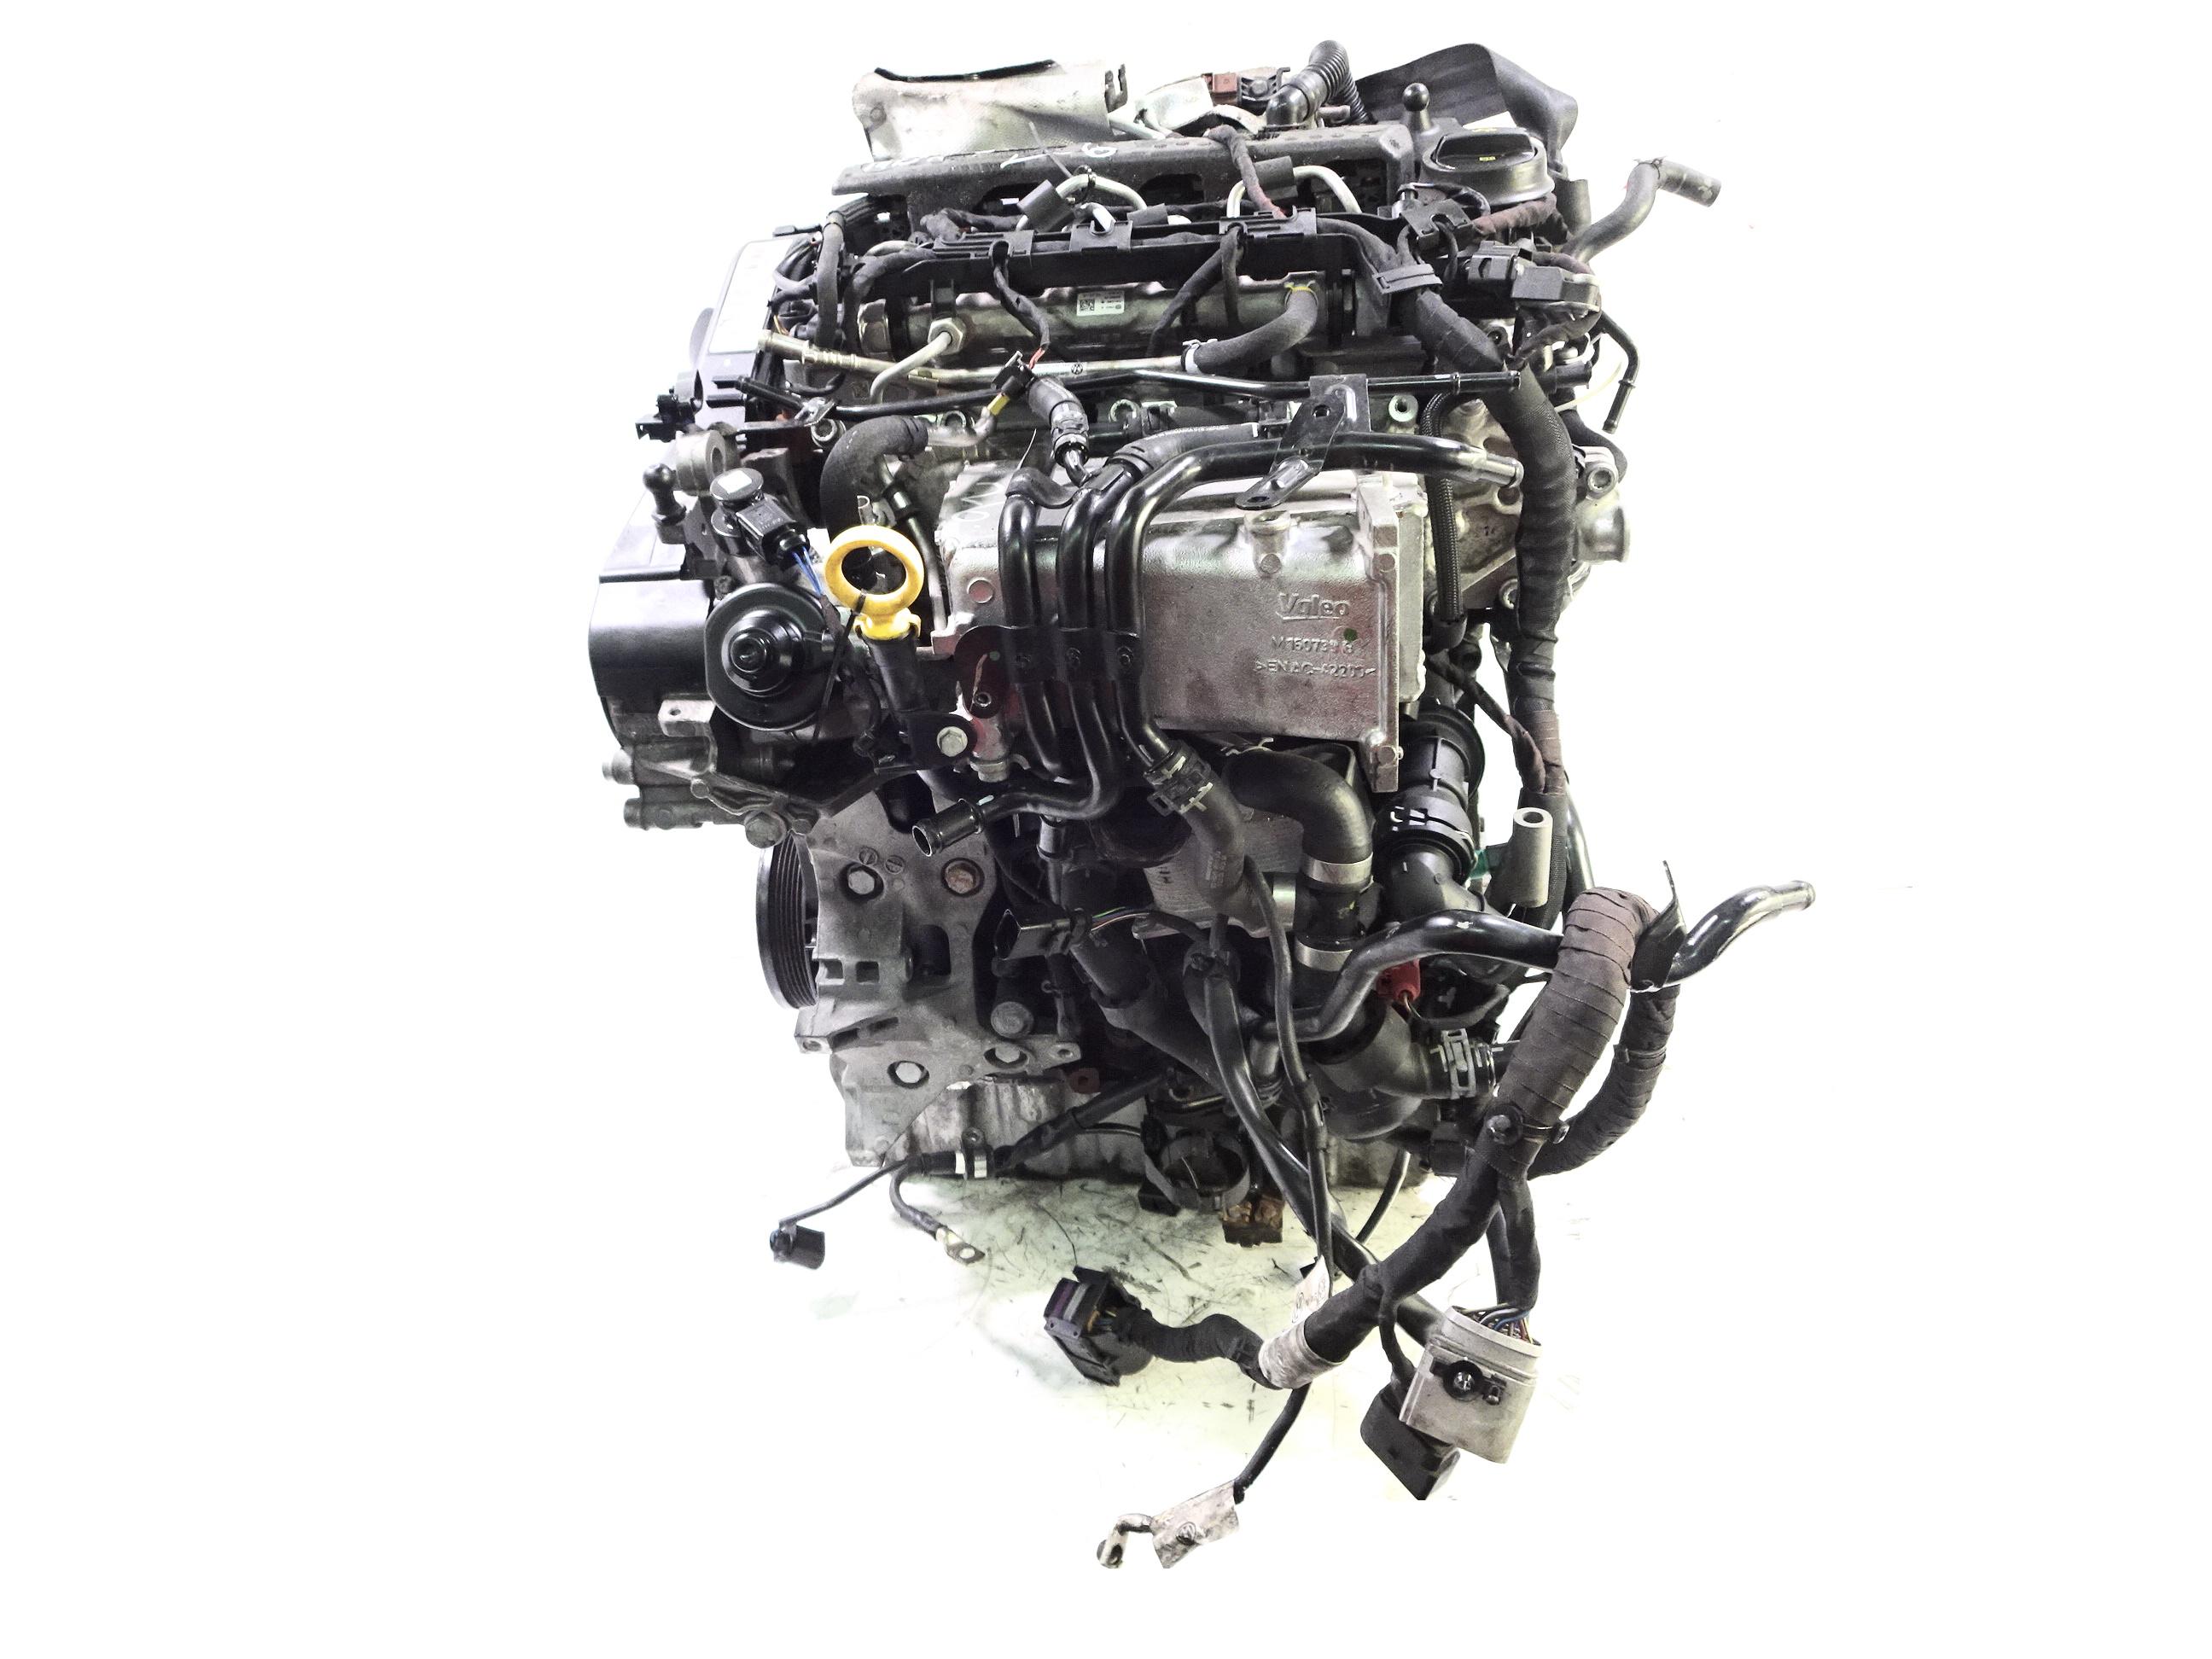 Motor 2015 Seat Skoda VW Leon Octavia 1,6 TDI CLH CLHA mit Anbauteilen